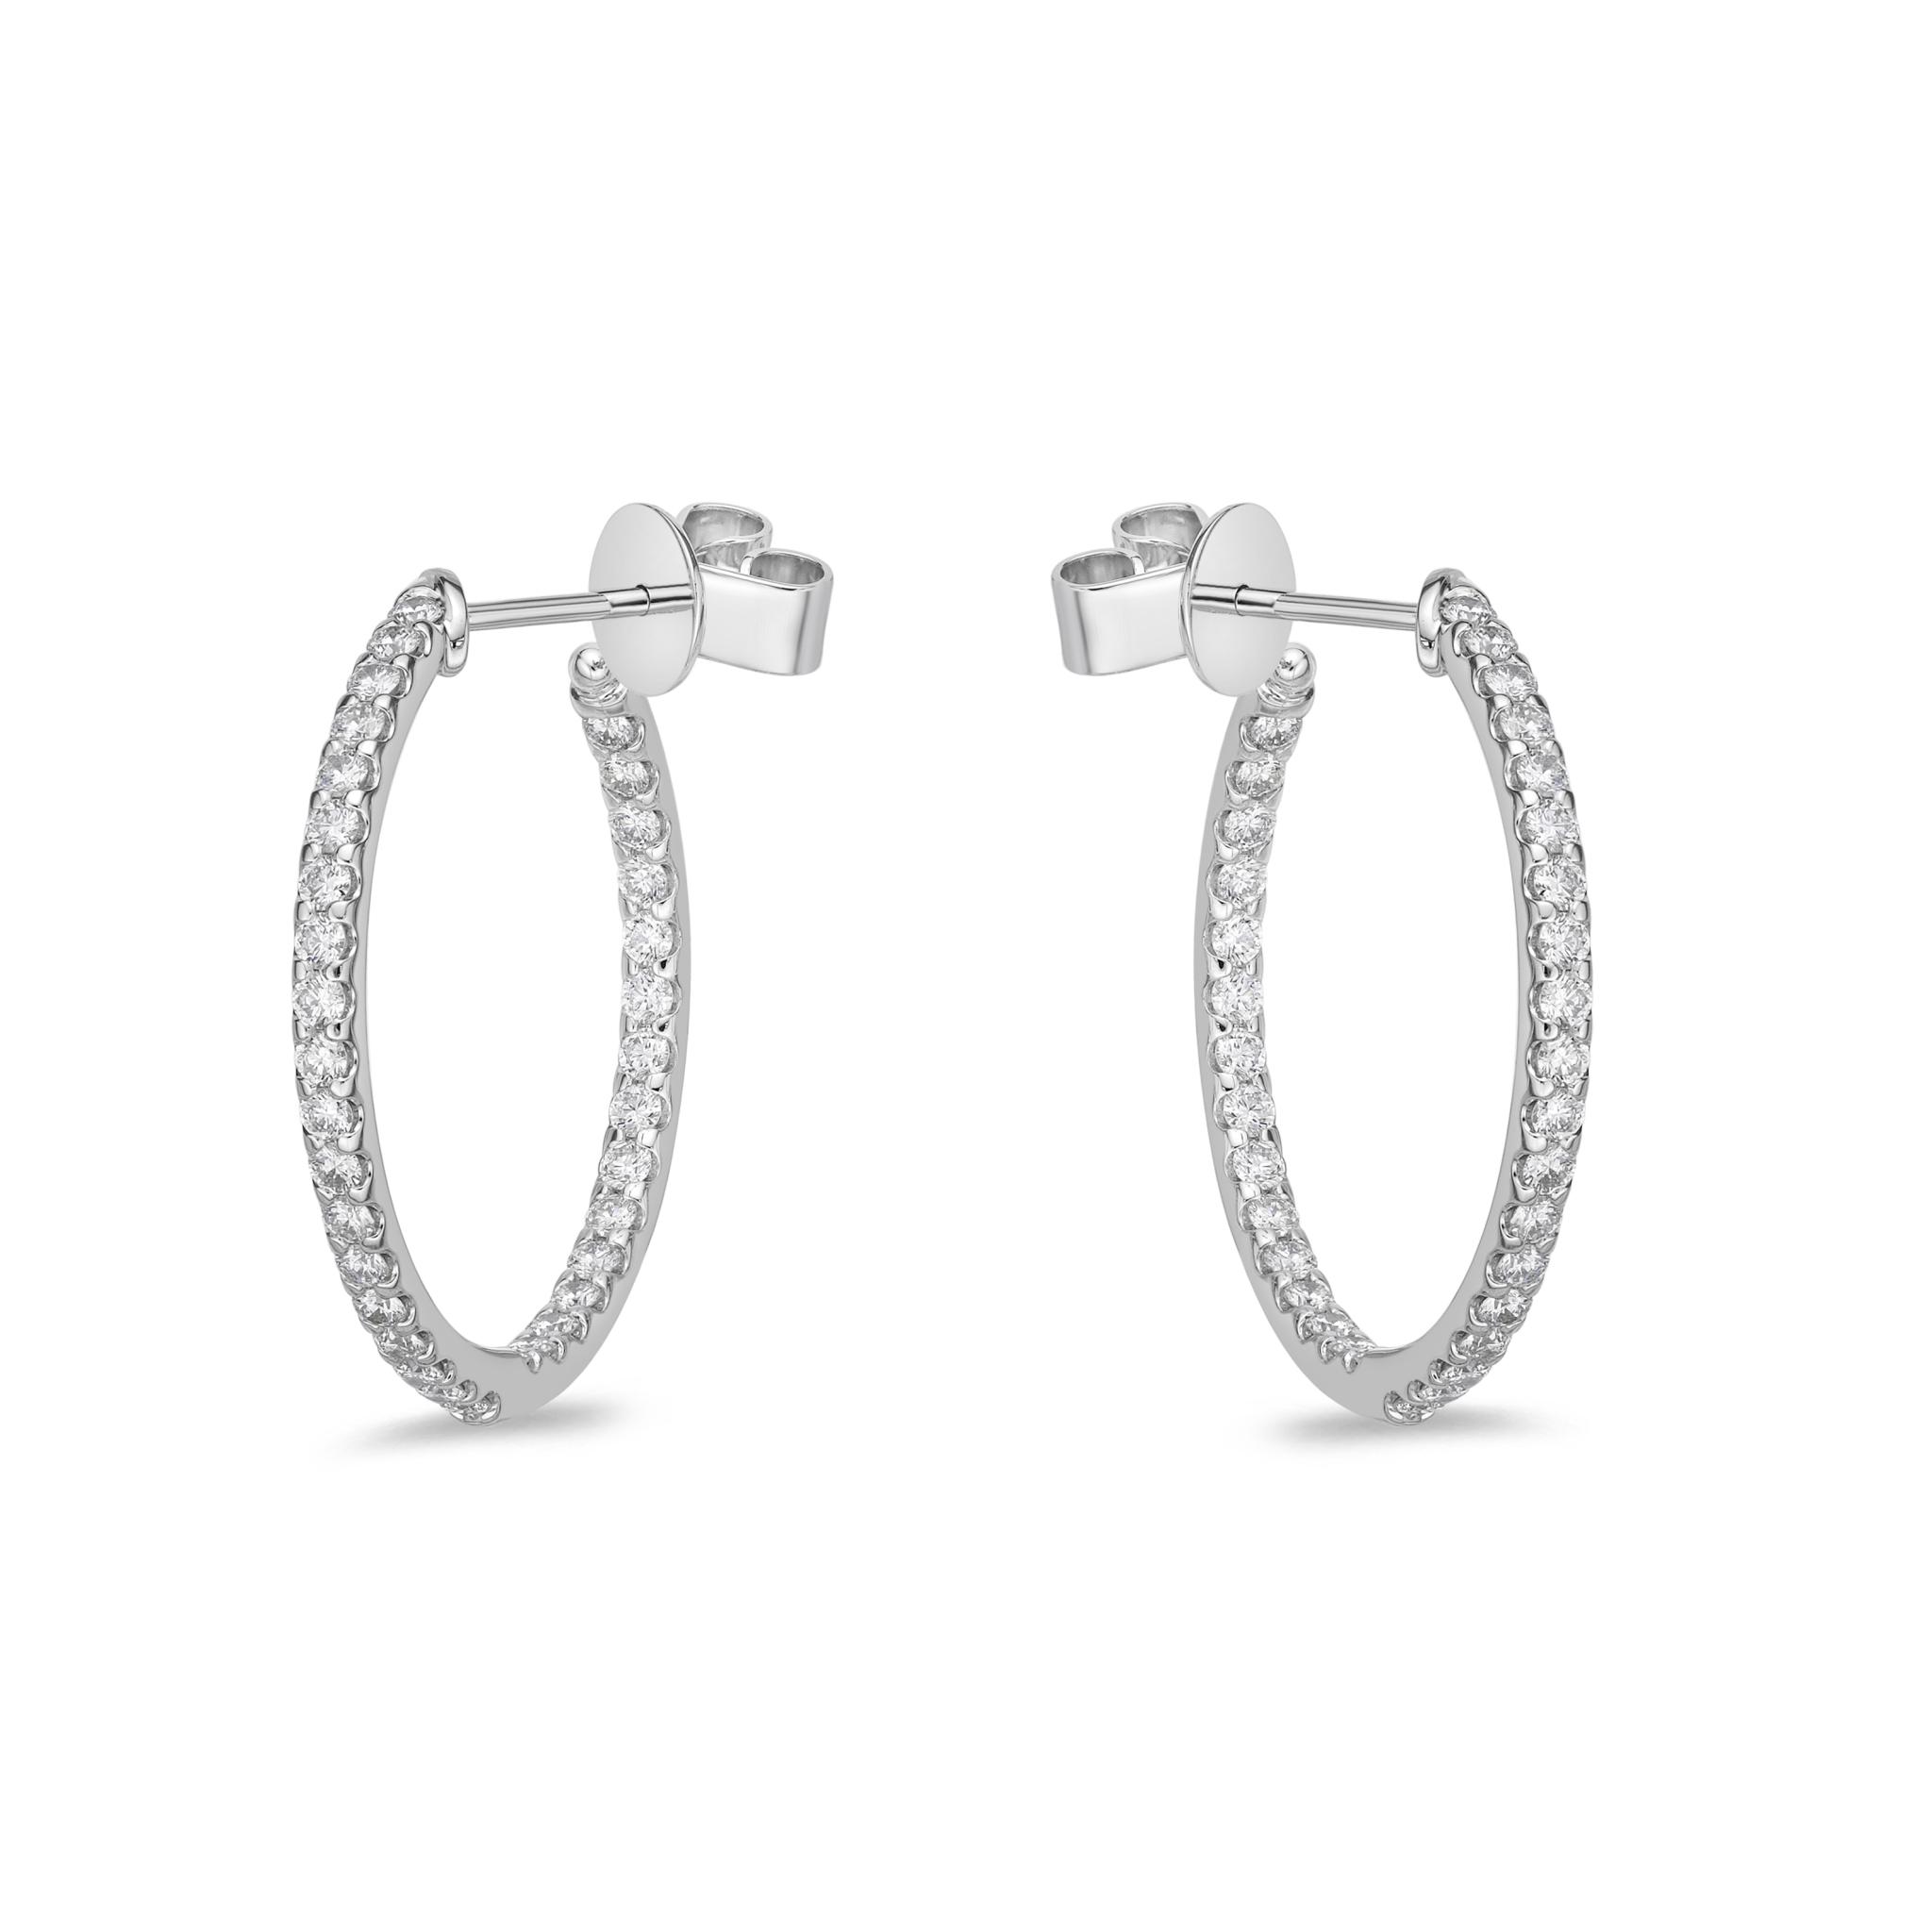 Memoire 18ct White Gold 1 Carat Diamond Odessa Hoop Earrings 24x24mm